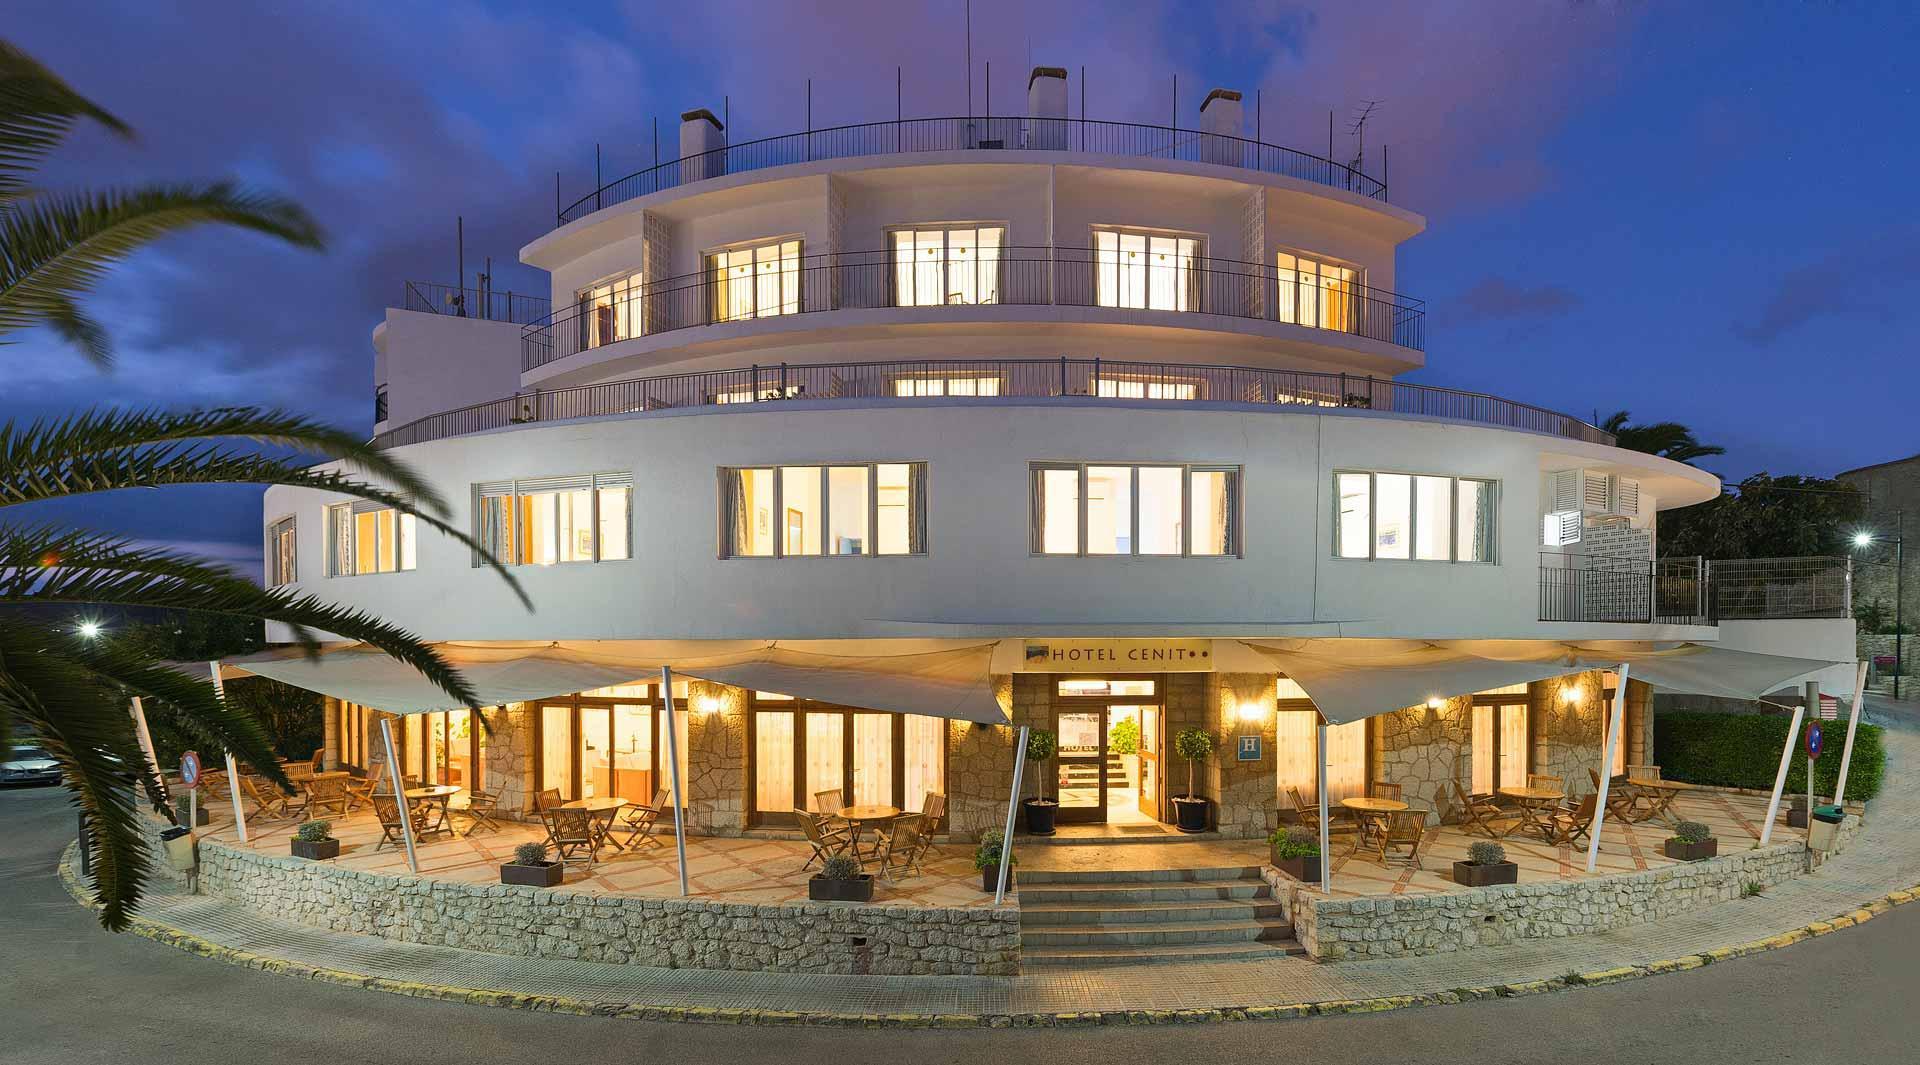 Cenit Hotel Figueretas Ibiza Spain Book Cenit Hotel Online